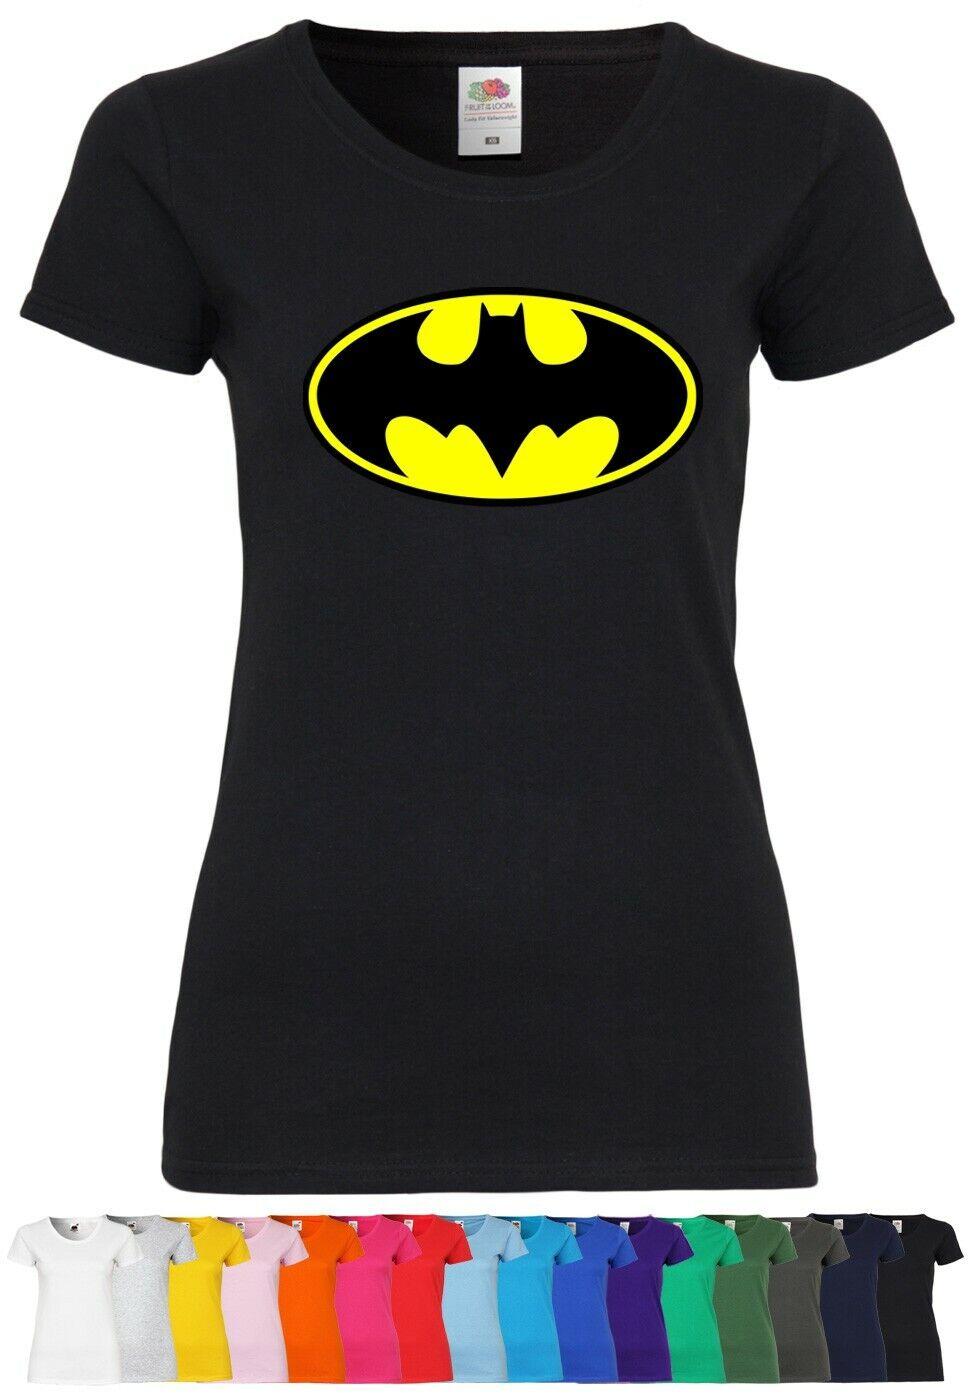 M120 F288N Damen T-Shirt mit Motiv Batman | Comic Superheld Print Freizeit Party